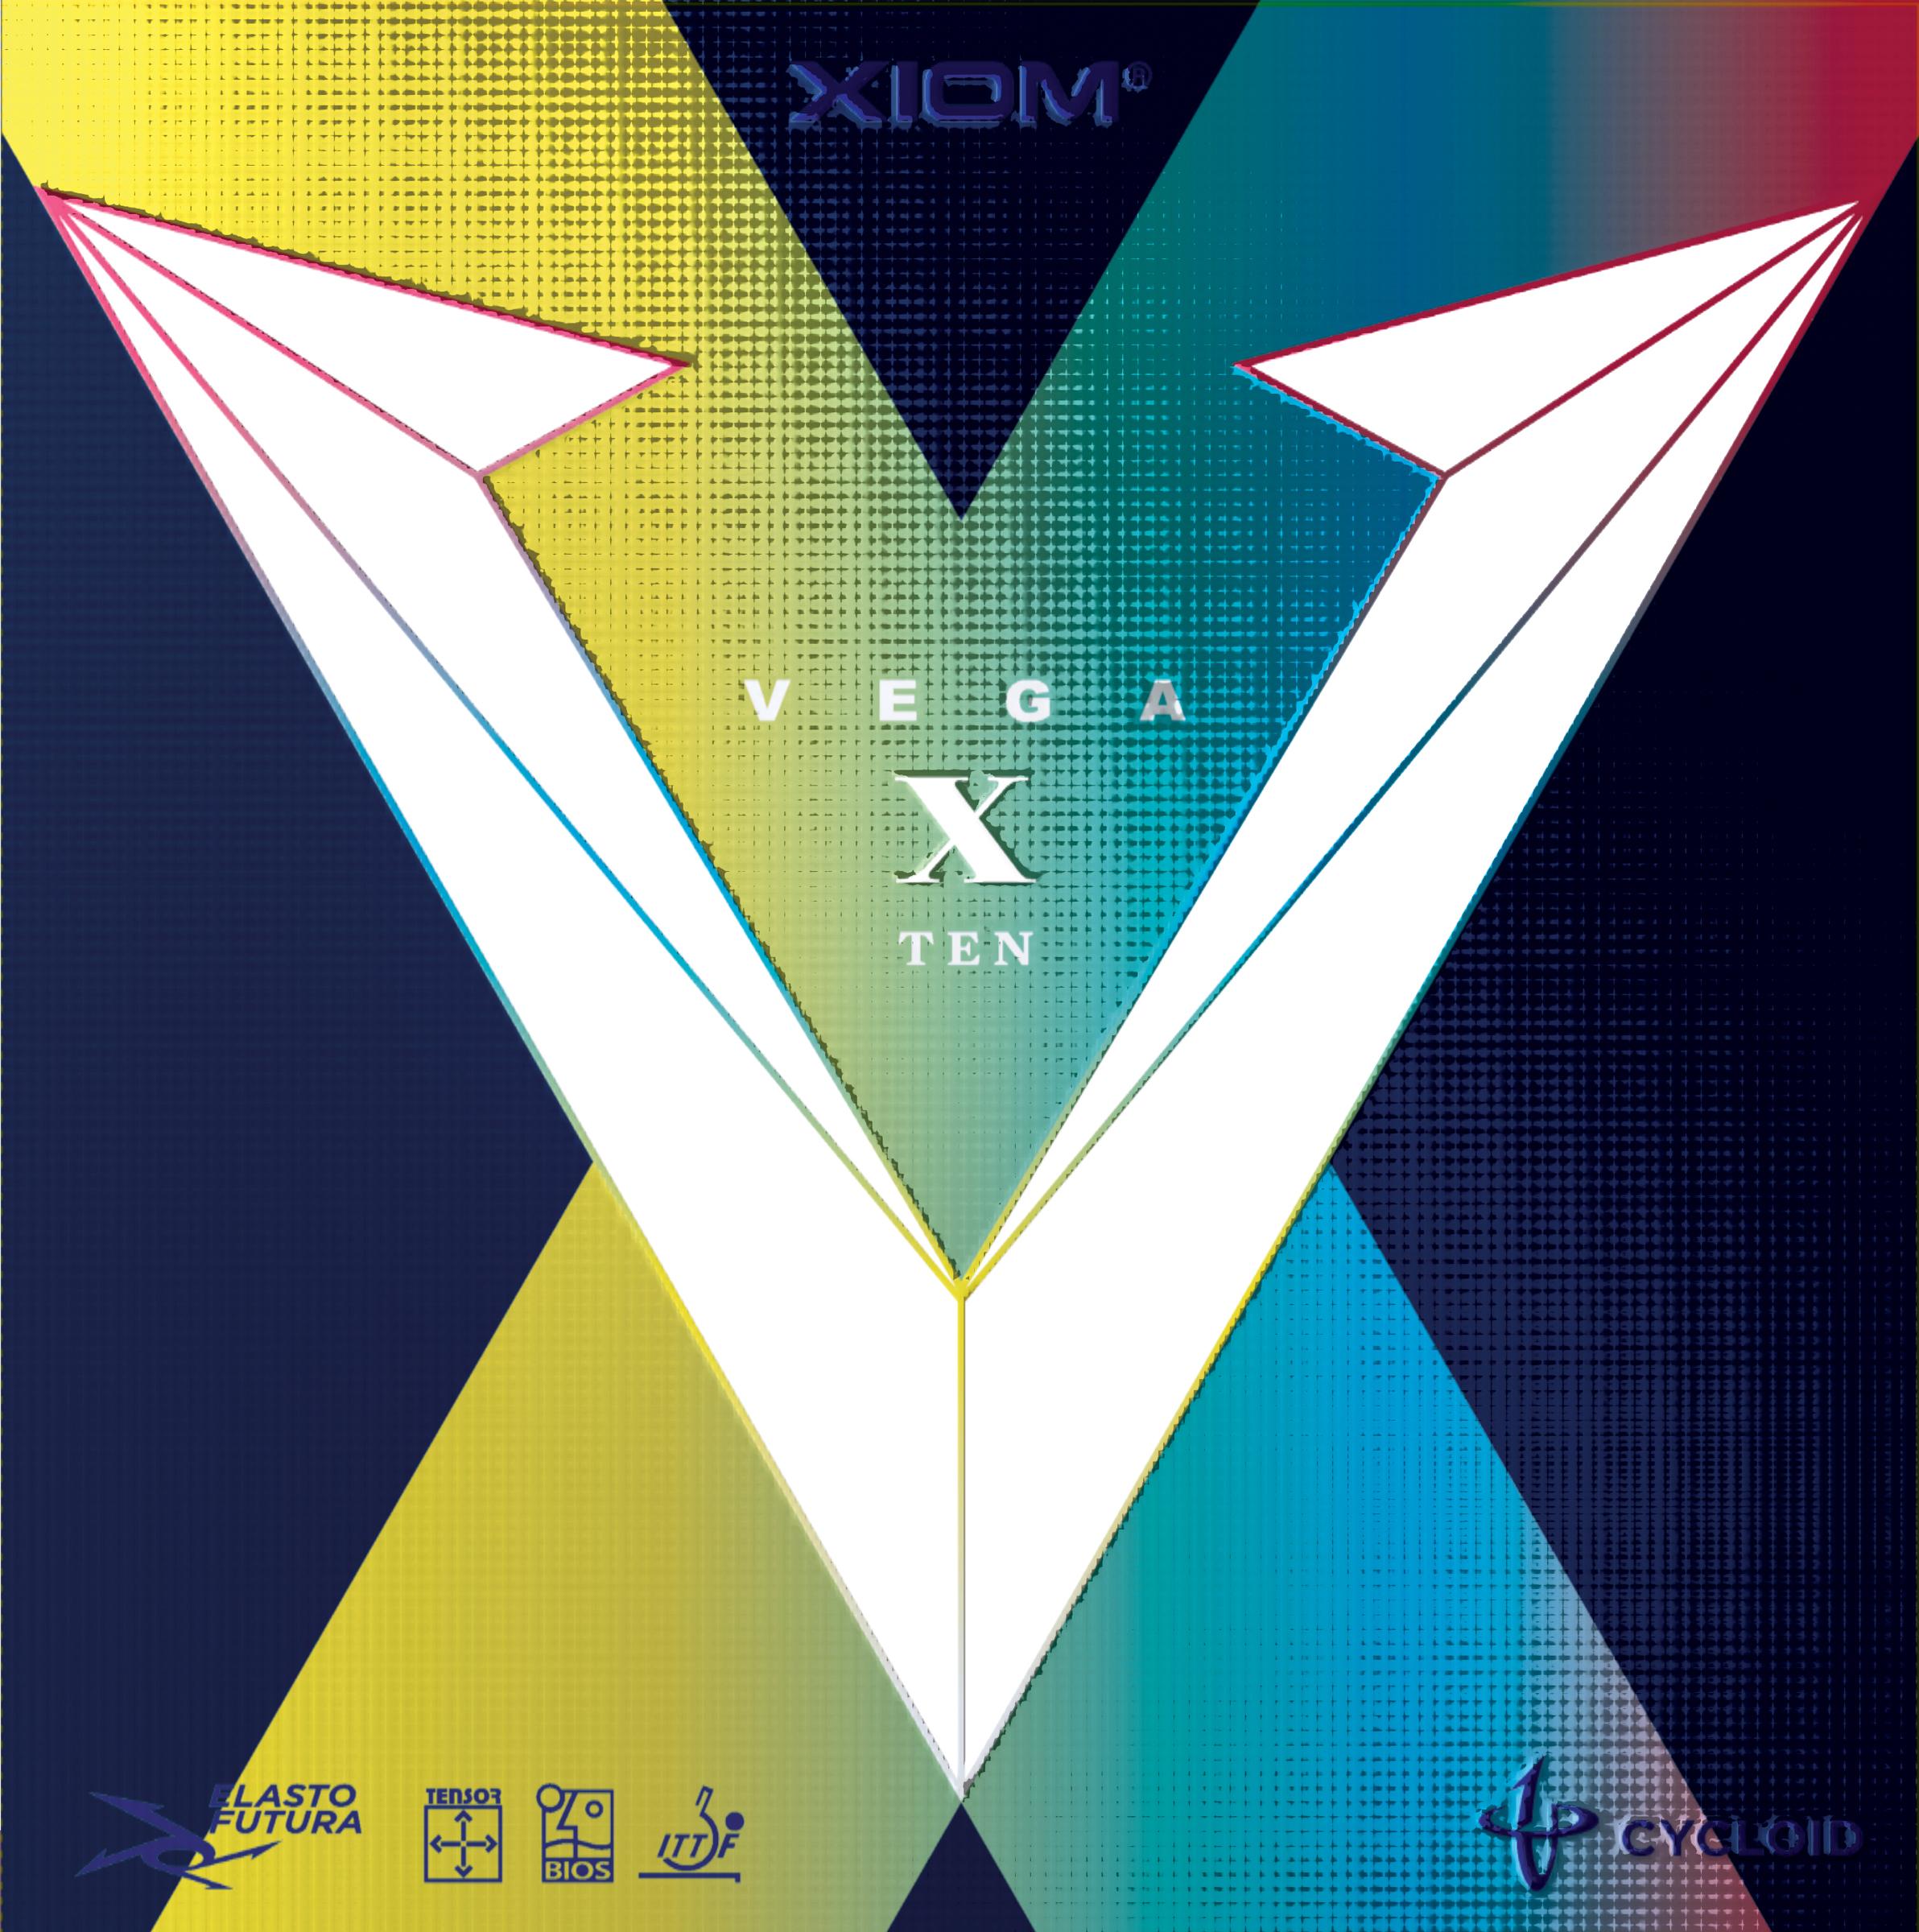 Novinka od XIOMu Vega X!